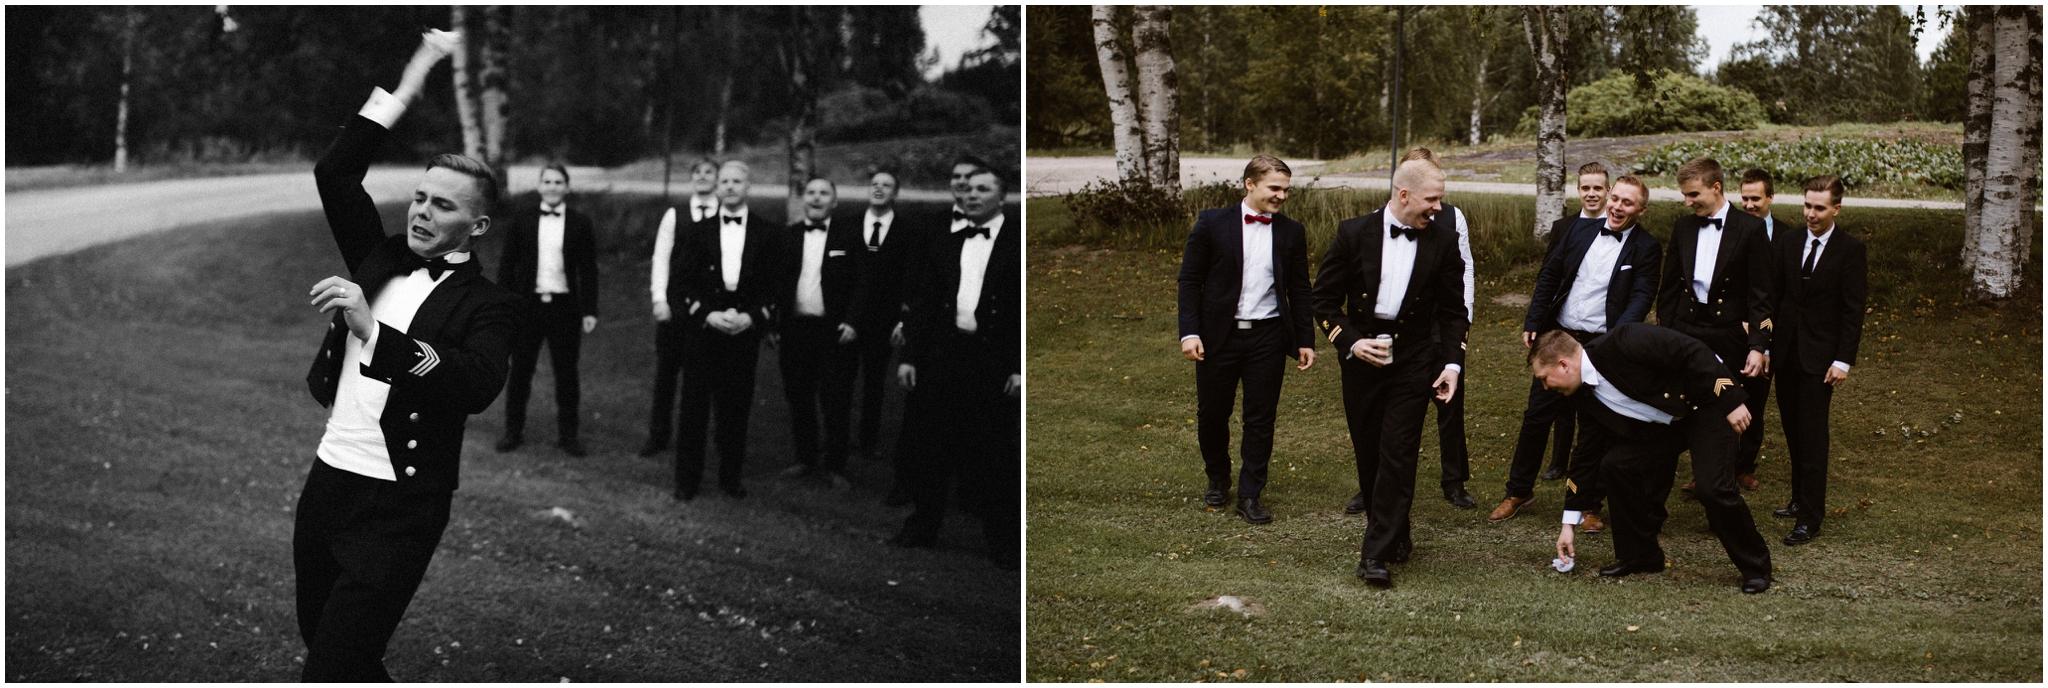 Pinja + Marko -- Patrick Karkkolainen Wedding Photographer-194.jpg